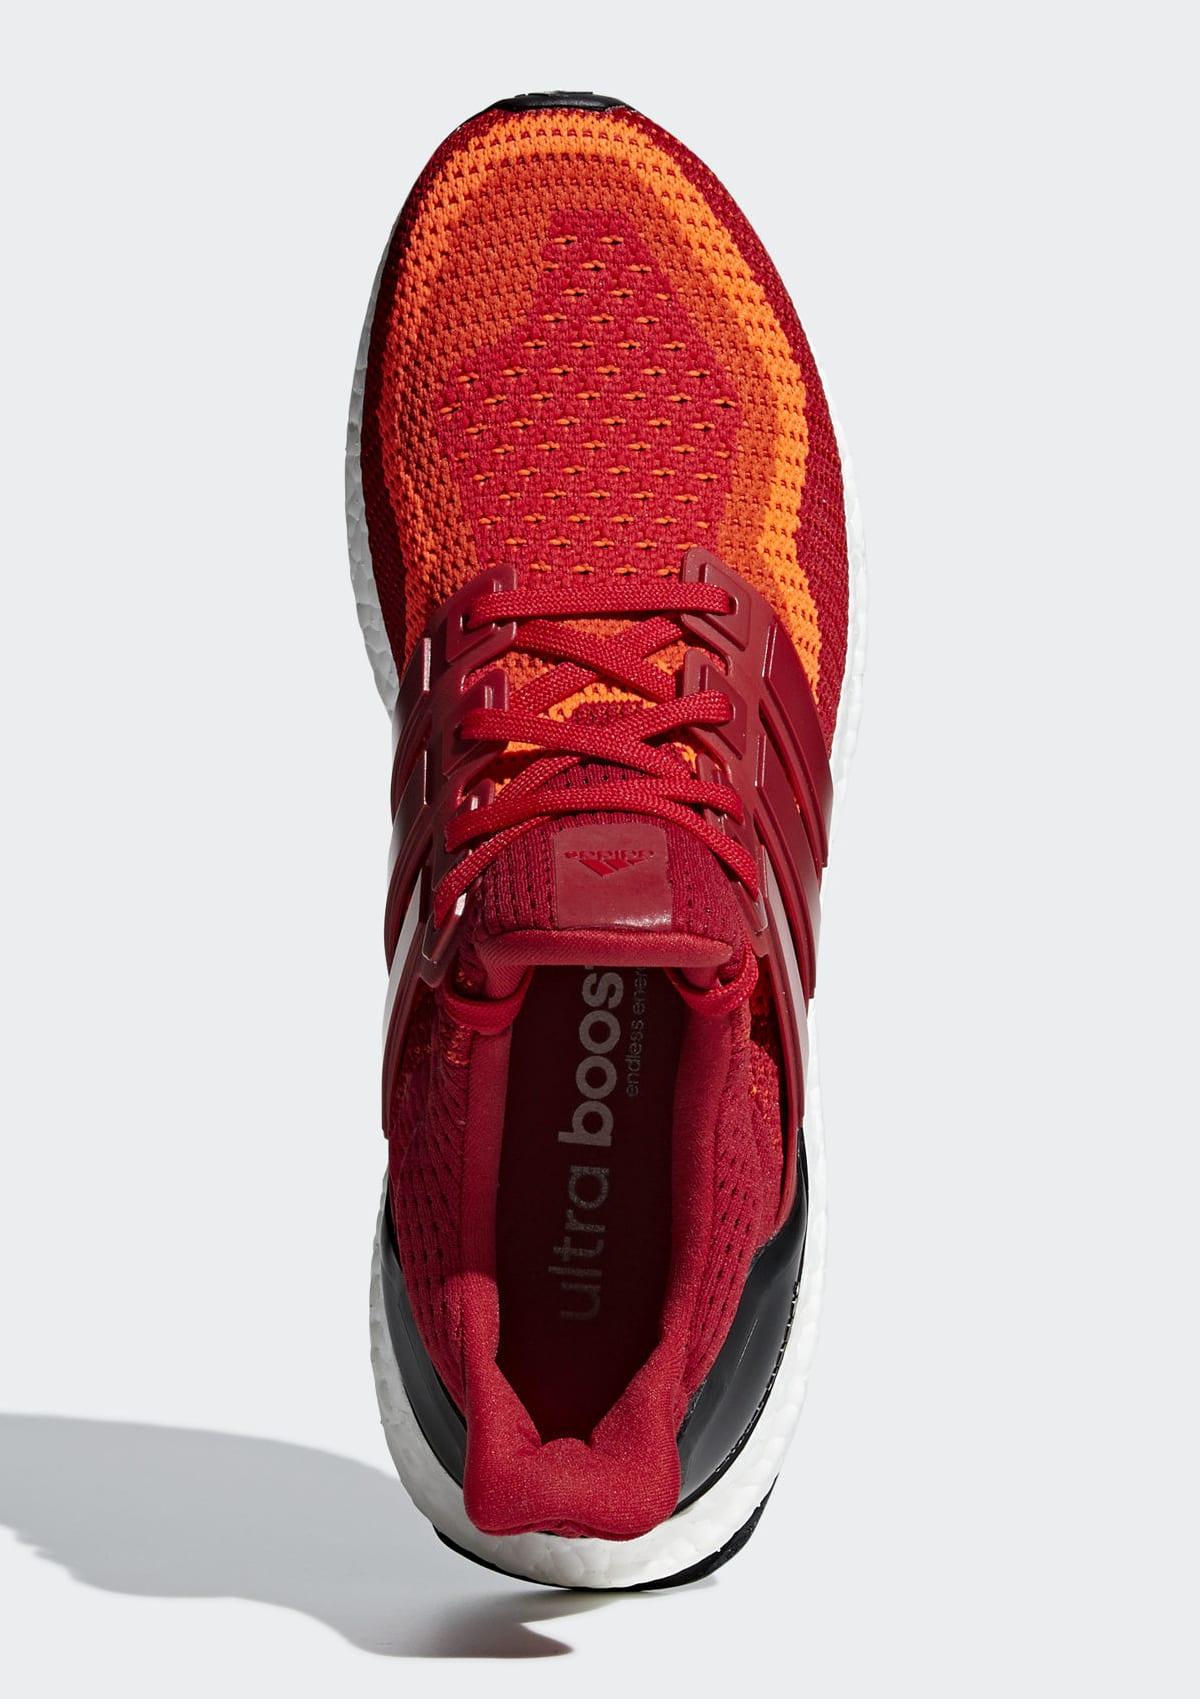 adidas-ultra-boost-2-0-red-gradient-aq4006-top